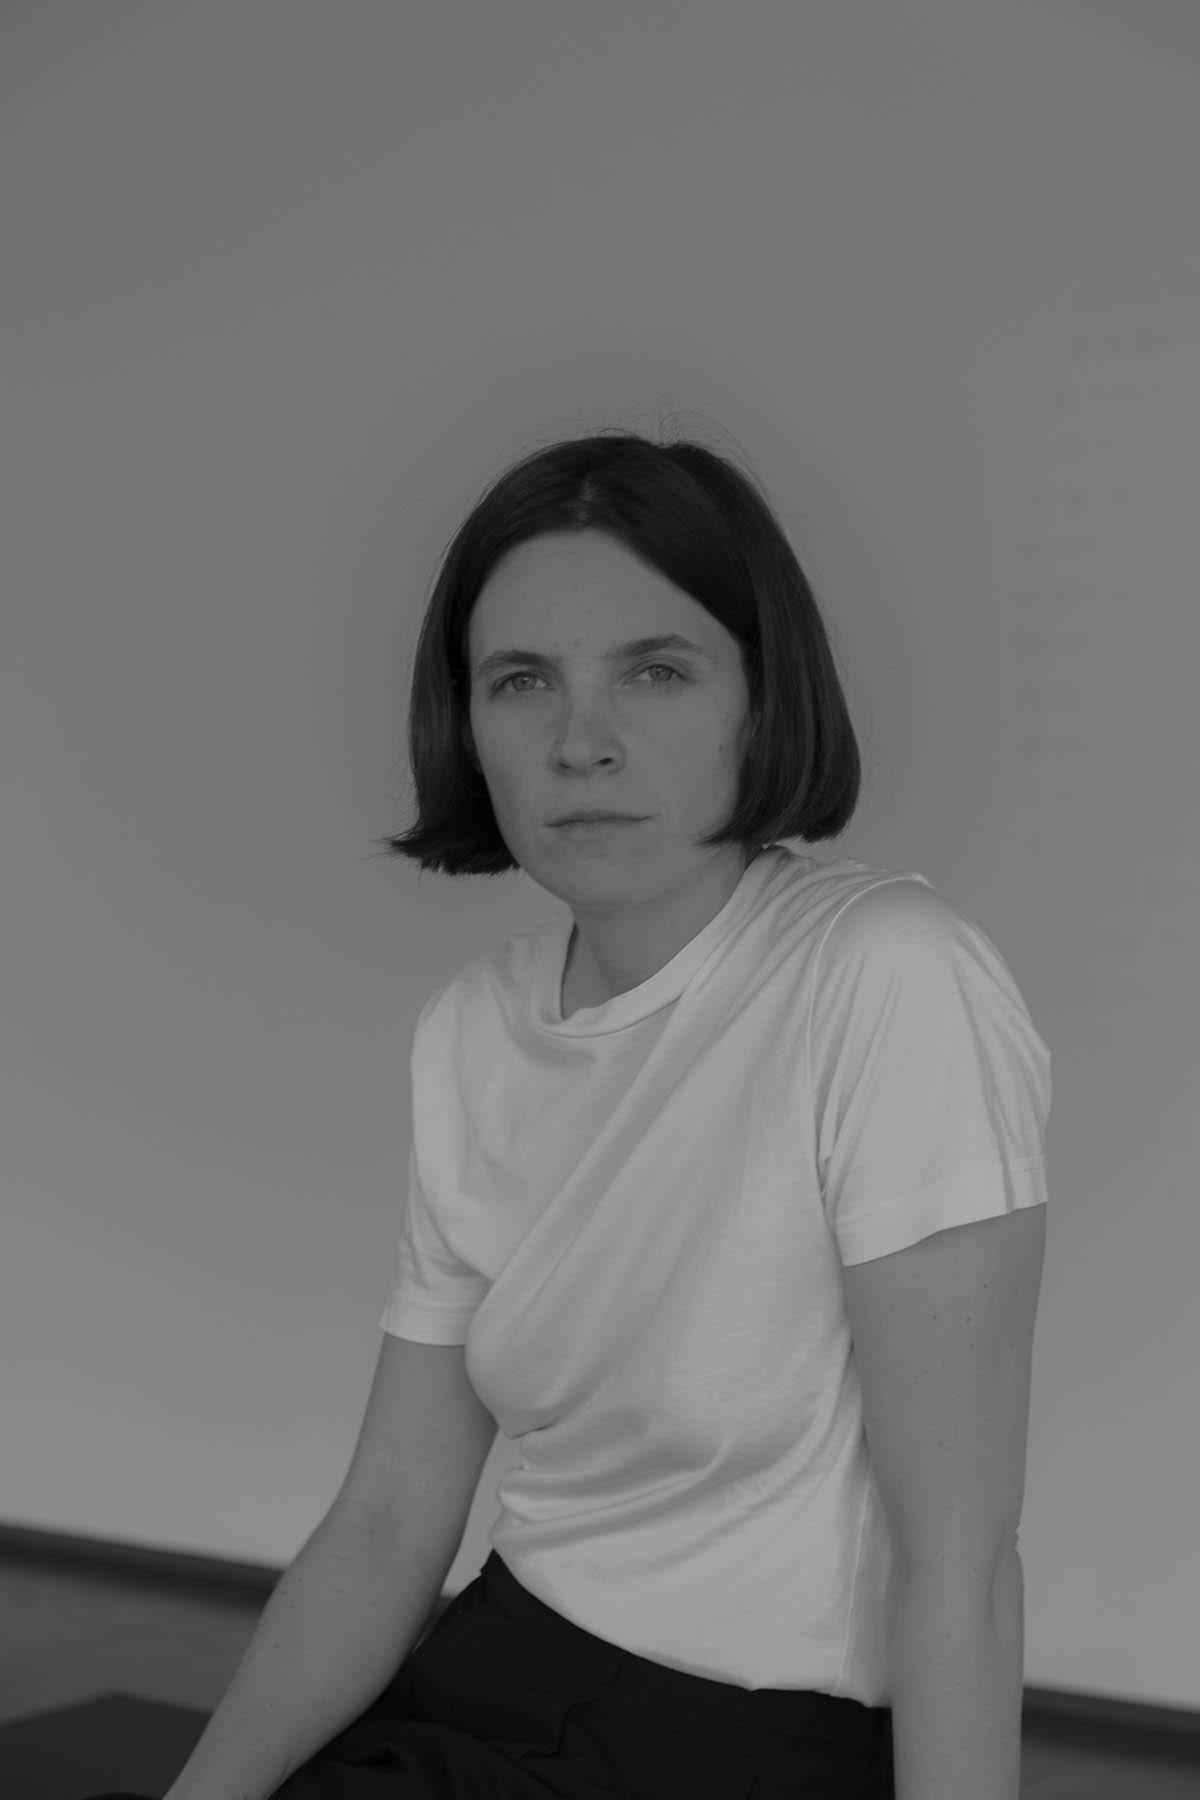 Barbara_Kapusta, Portrait Foto: Marie Haefner Courtesy Gianni Manhattan und Barbara Kapusta